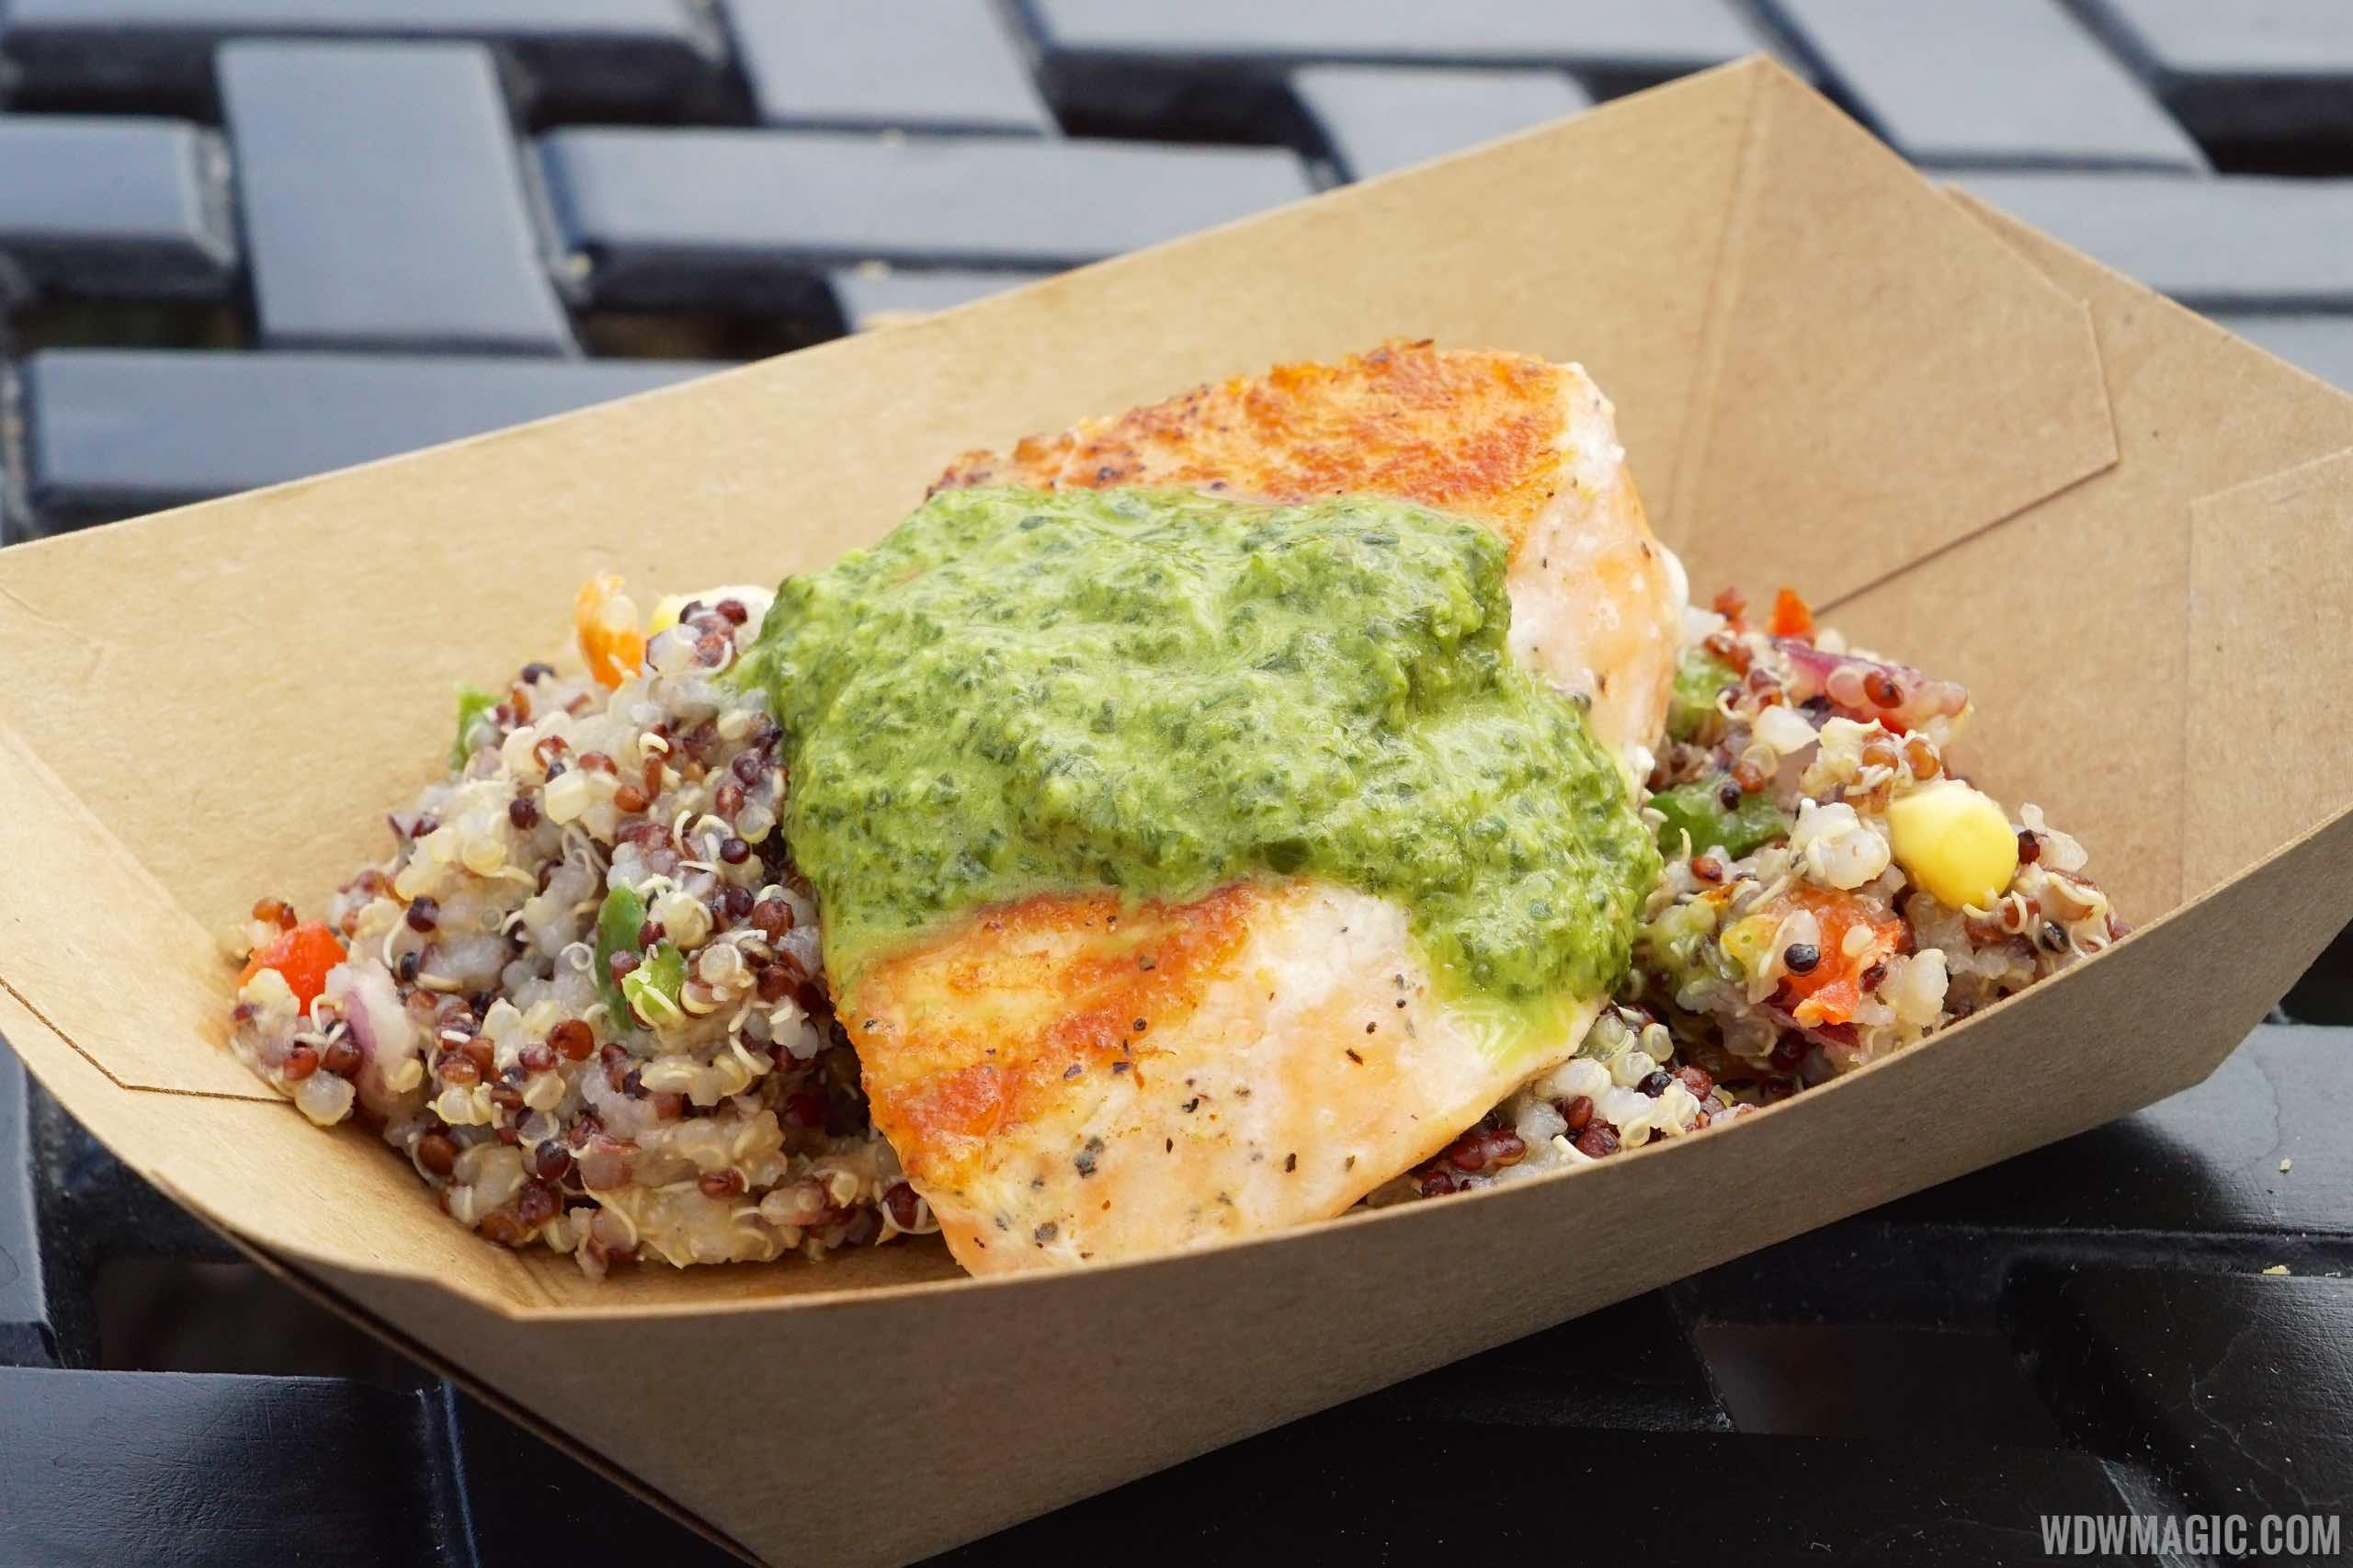 Patagonia - Roasted Verlasso salmon with quinoa salad and arugula chimichurri